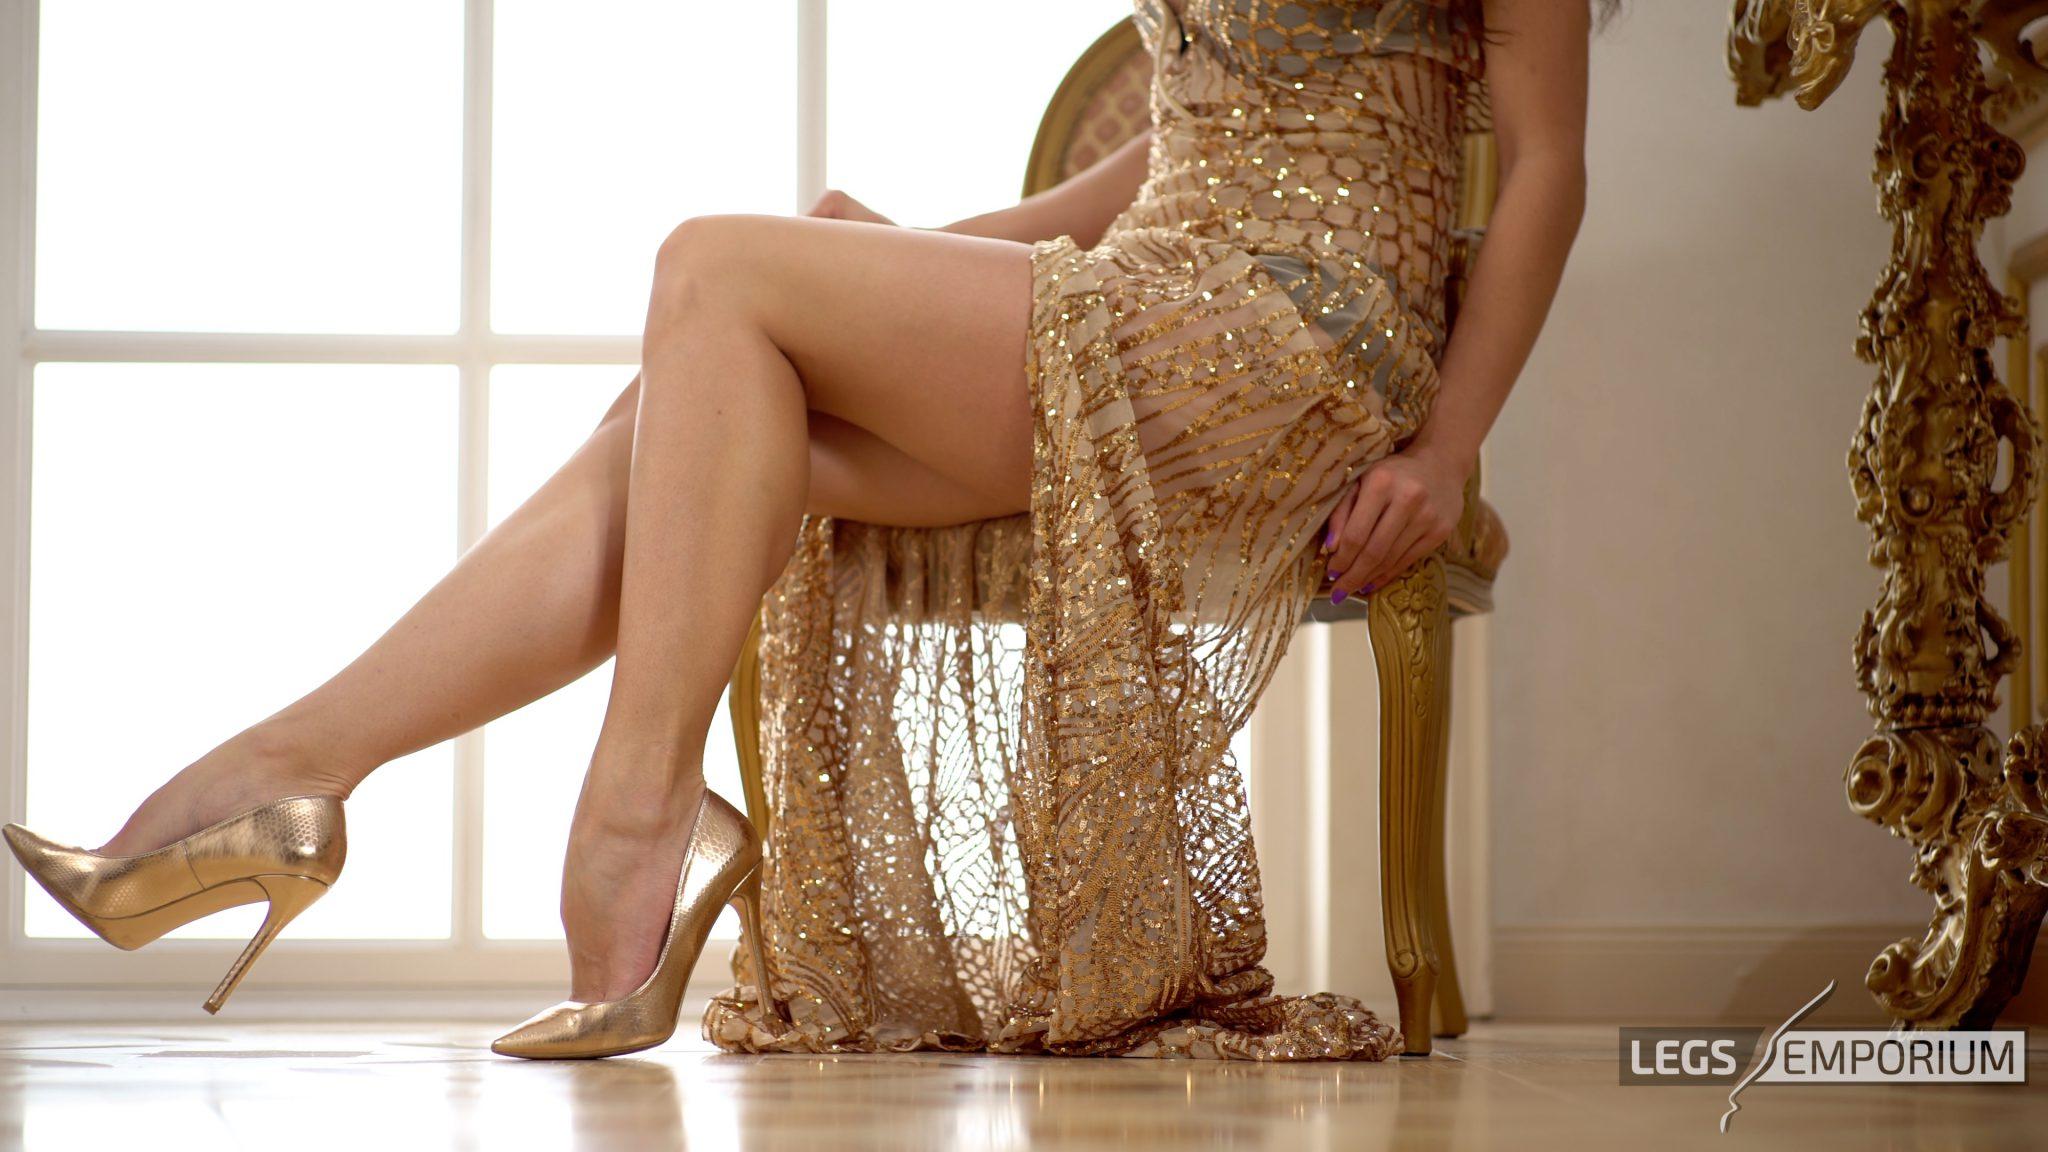 Elena generi naked adult pics HD